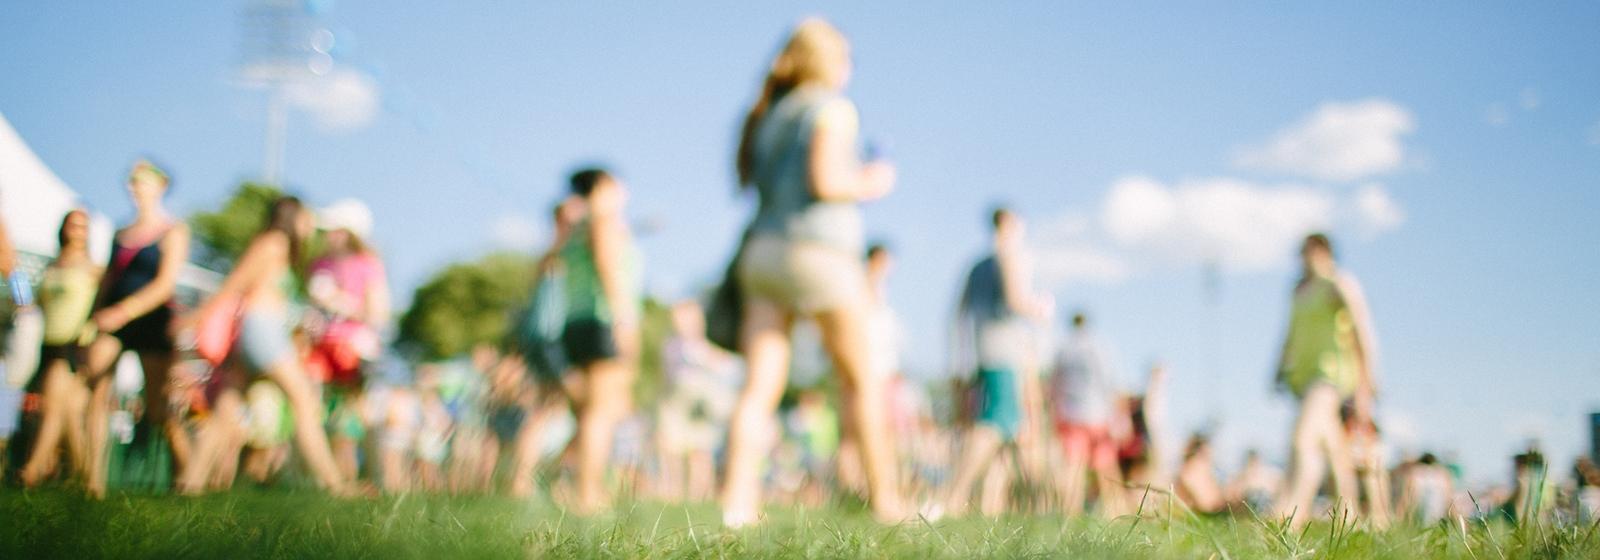 17 летних фестивалей в Москве и Питере